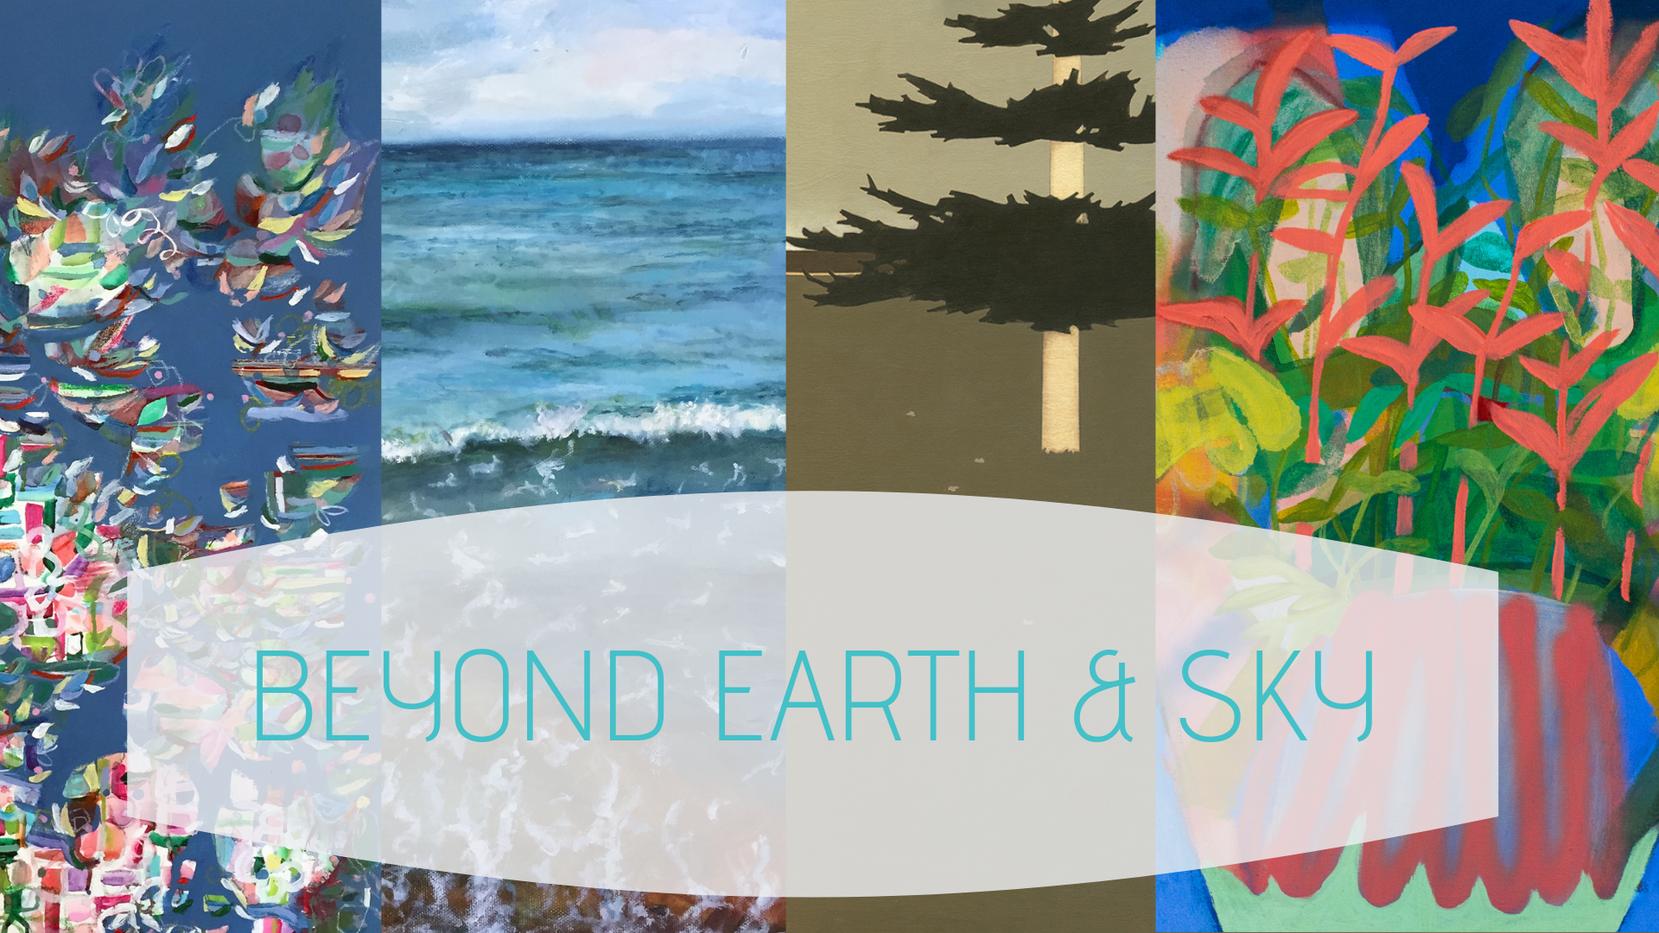 BEYOND EARTH & SKY